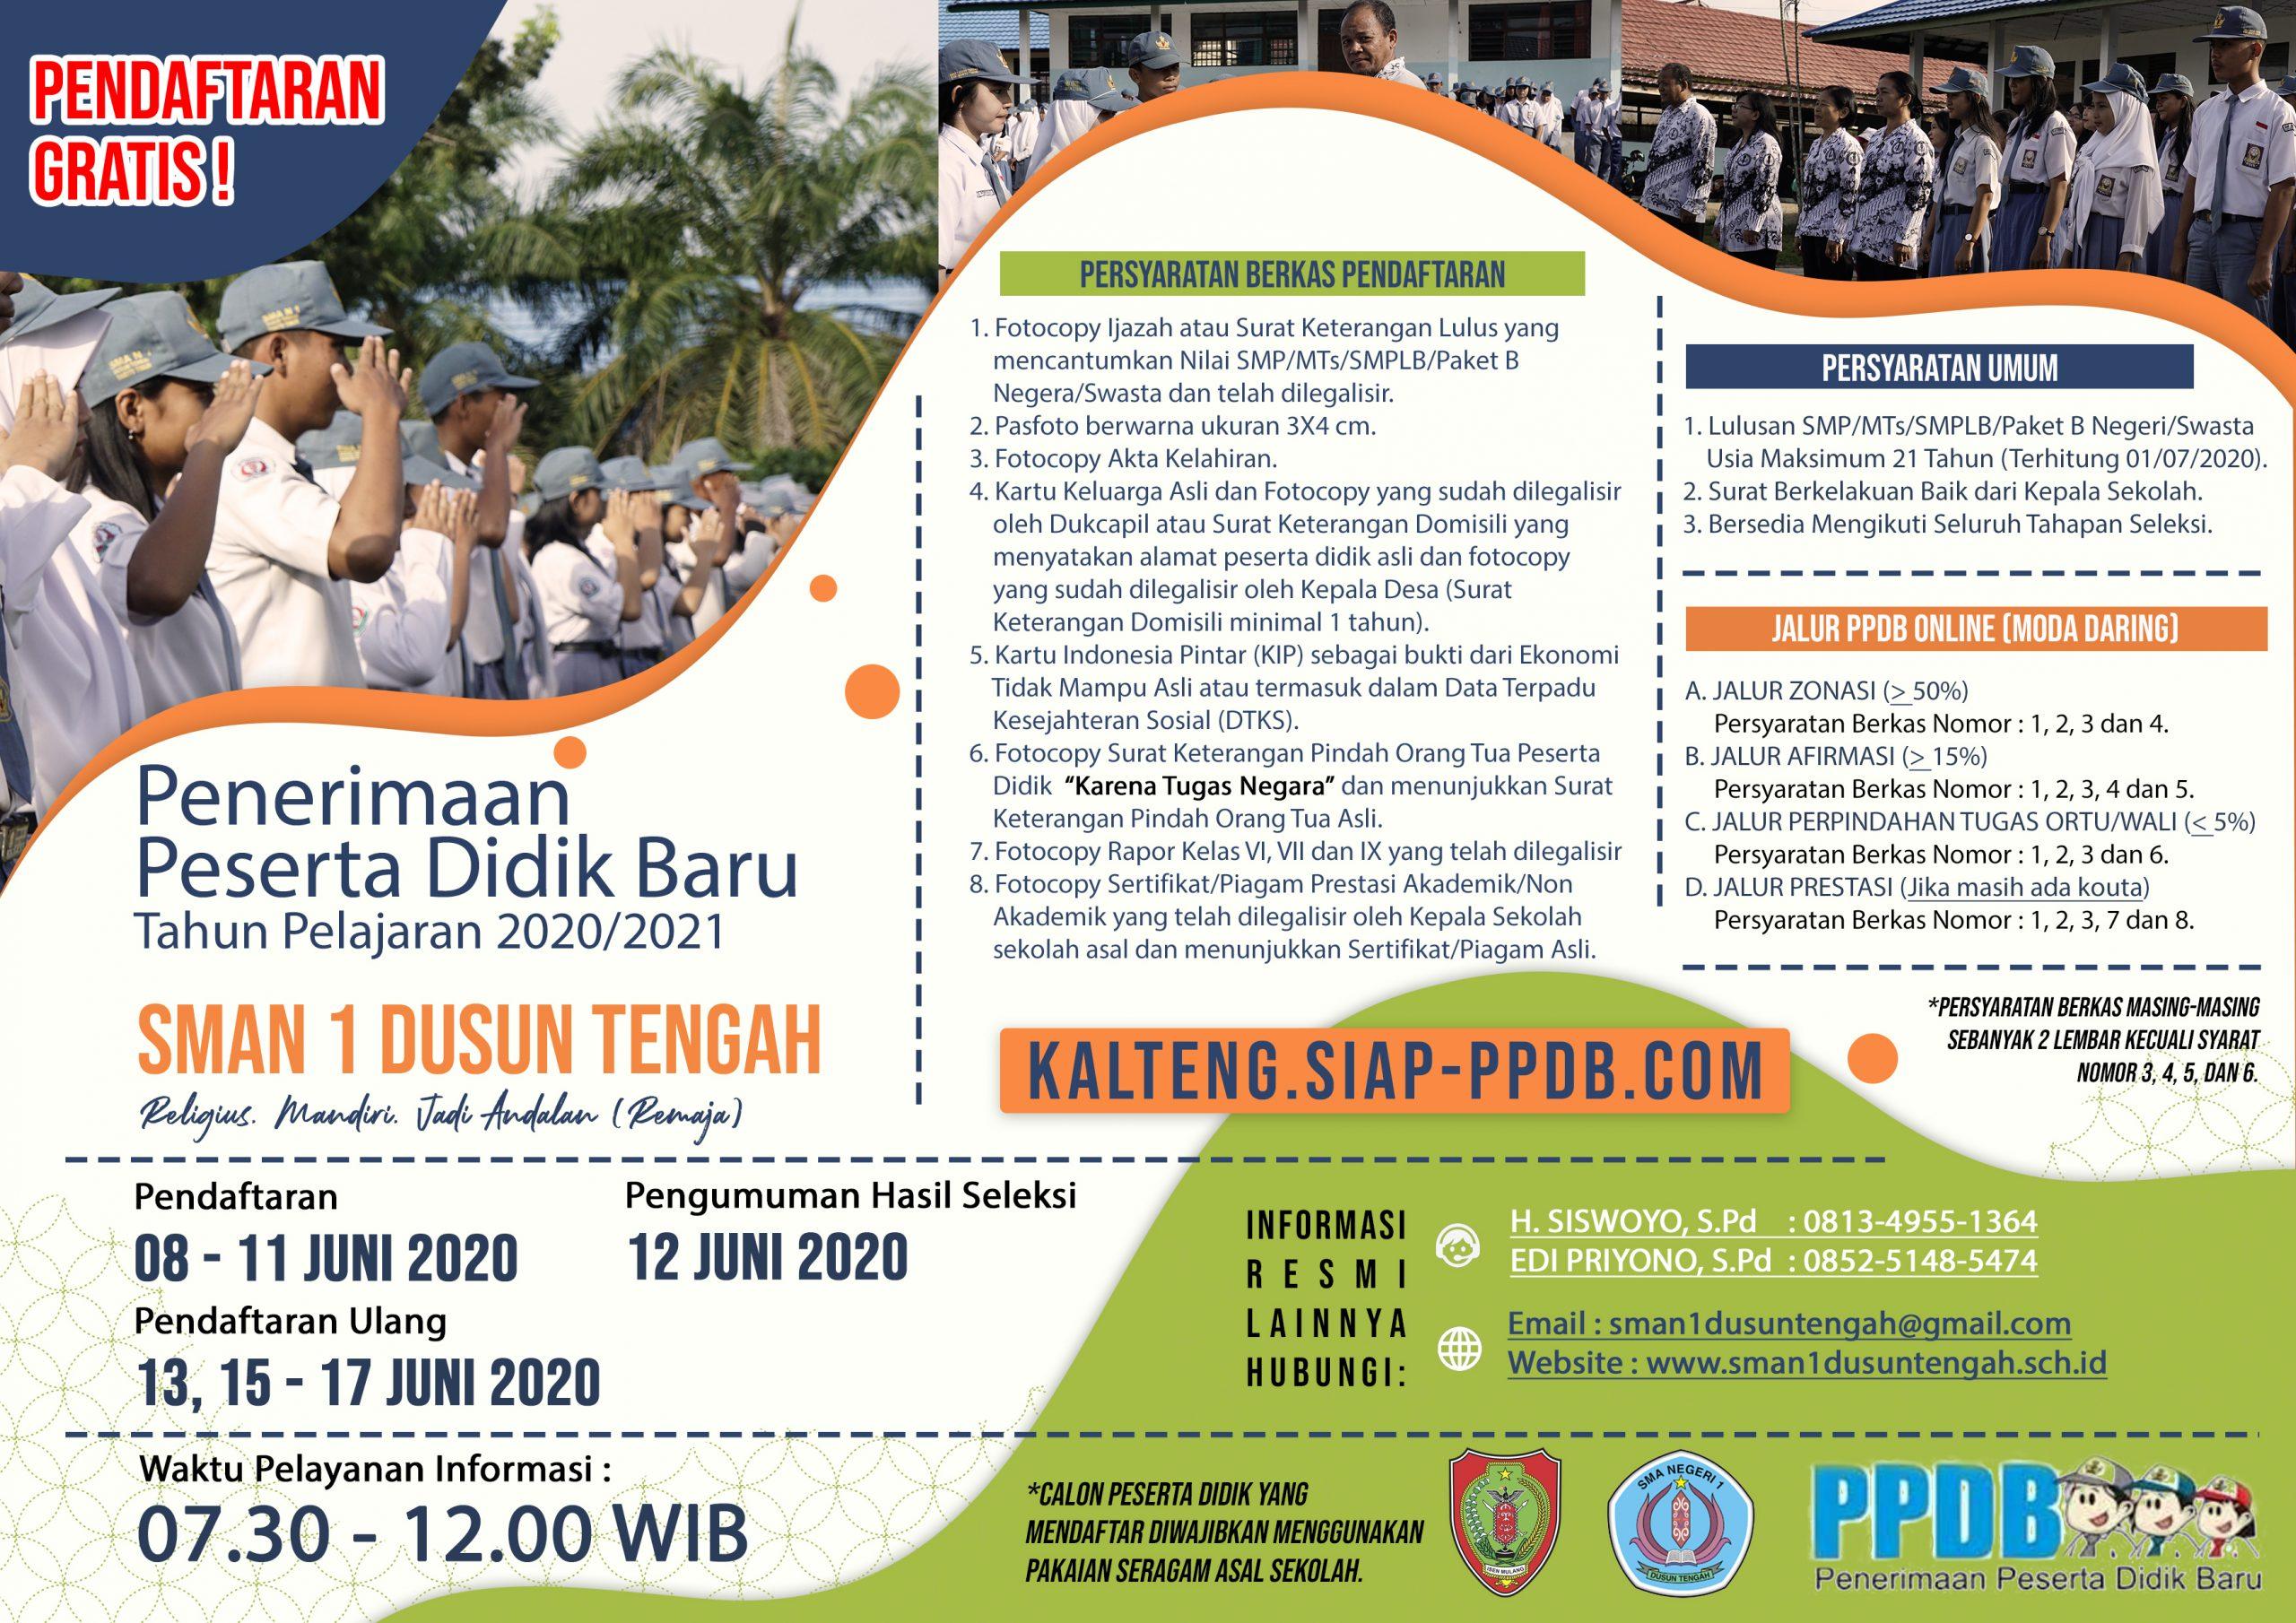 Penerimaan Peserta Didik Baru (PPDB) Online SMAN 1 Dusun Tengah Tahun Pelajaran 2020/2021